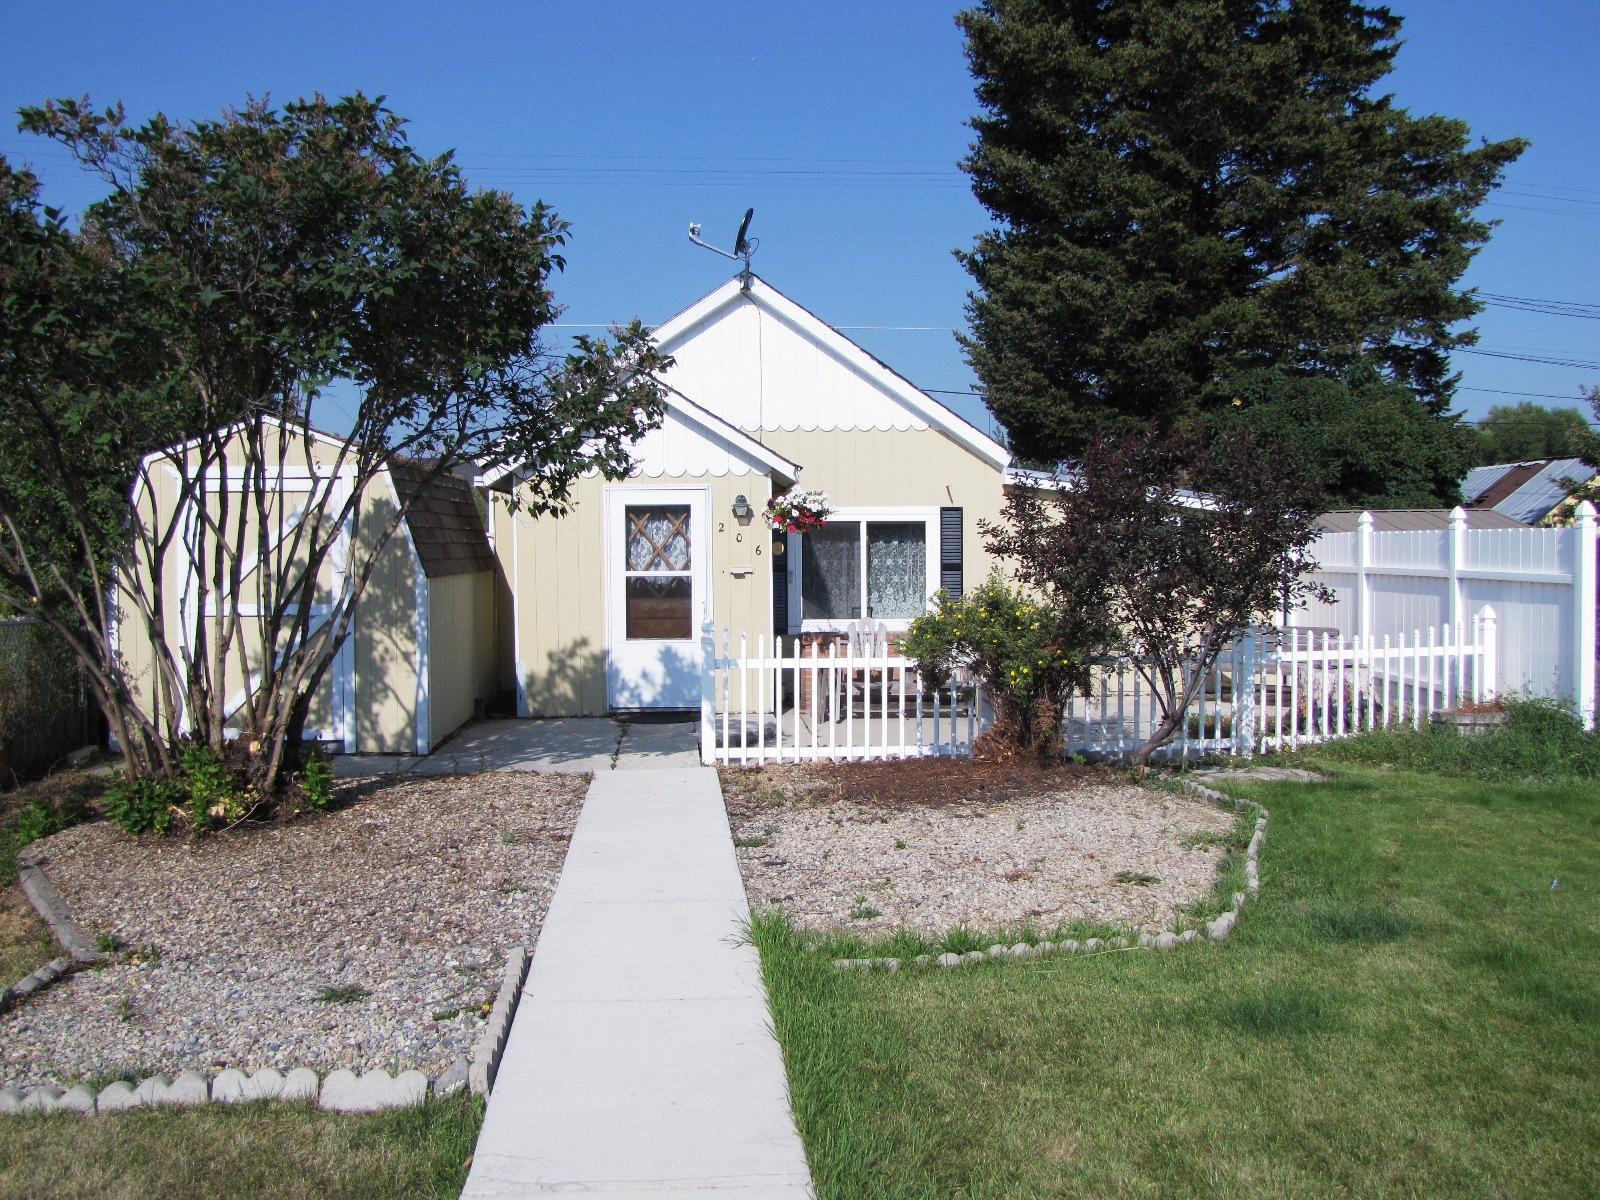 206 Main Street, Deer Lodge, MT 59722